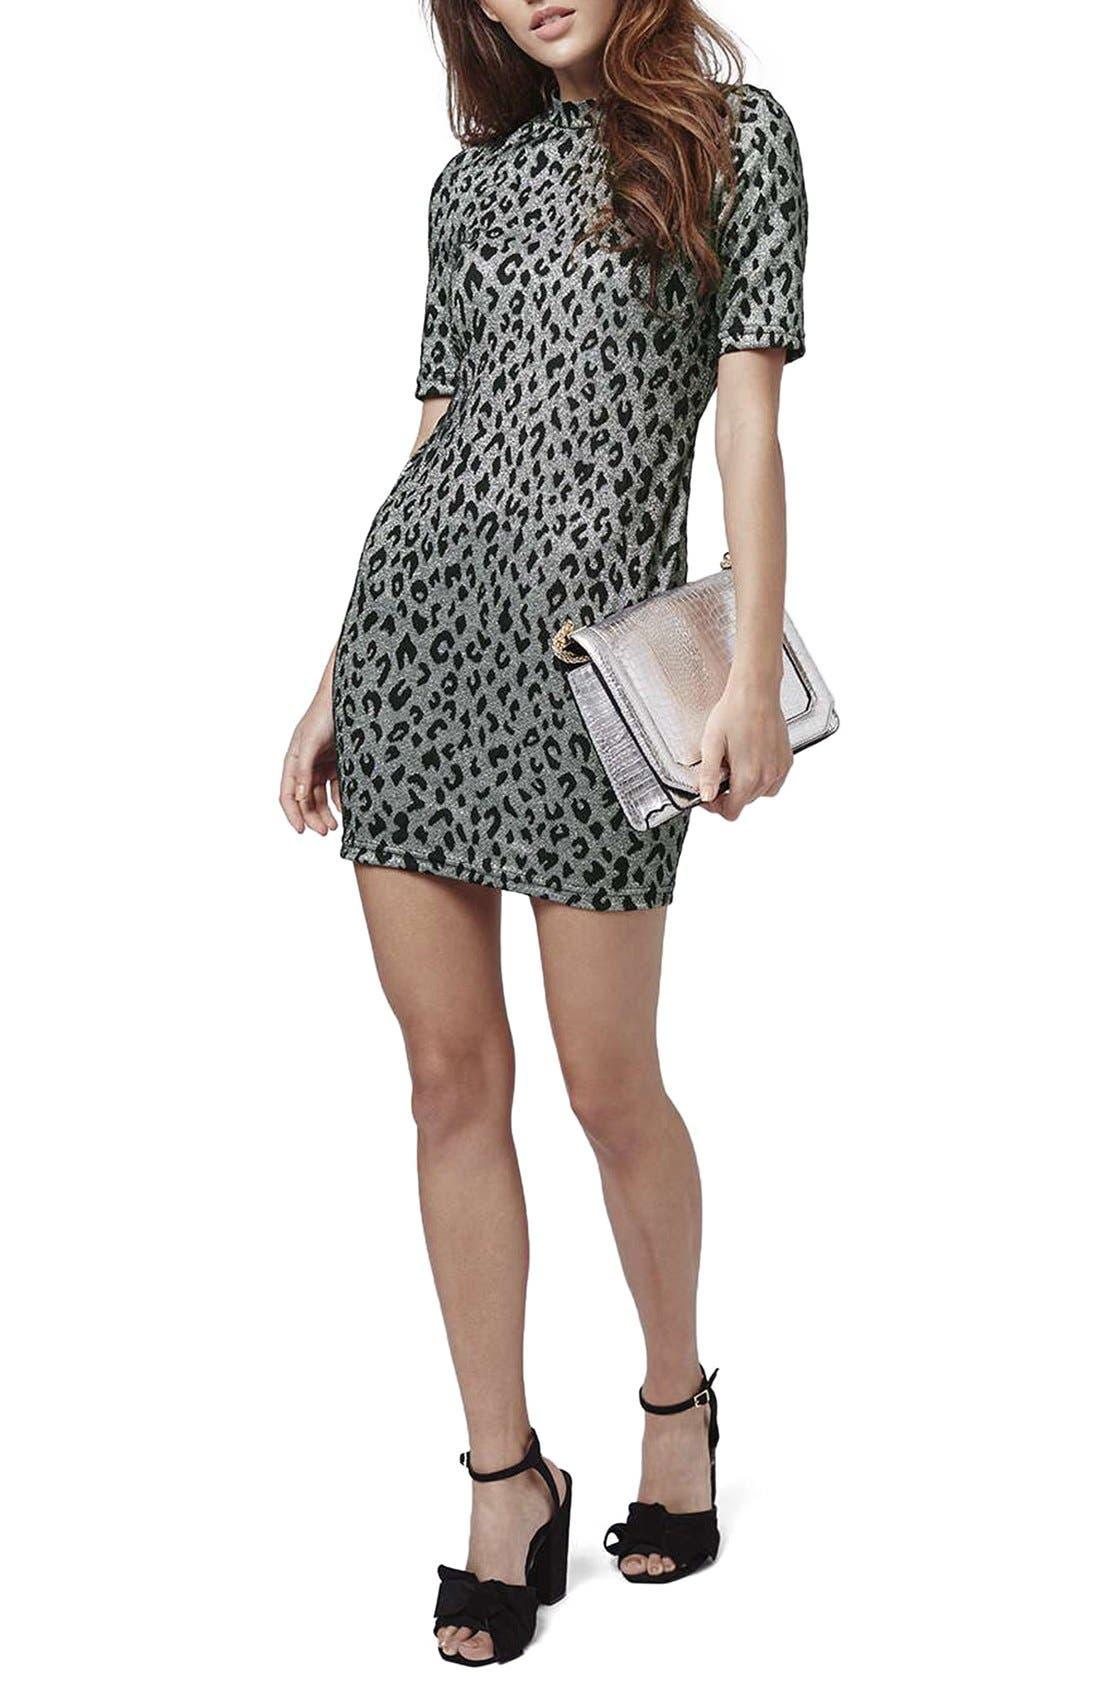 Alternate Image 1 Selected - Topshop Jacquard Leopard Body-Con Dress (Regular & Petite)